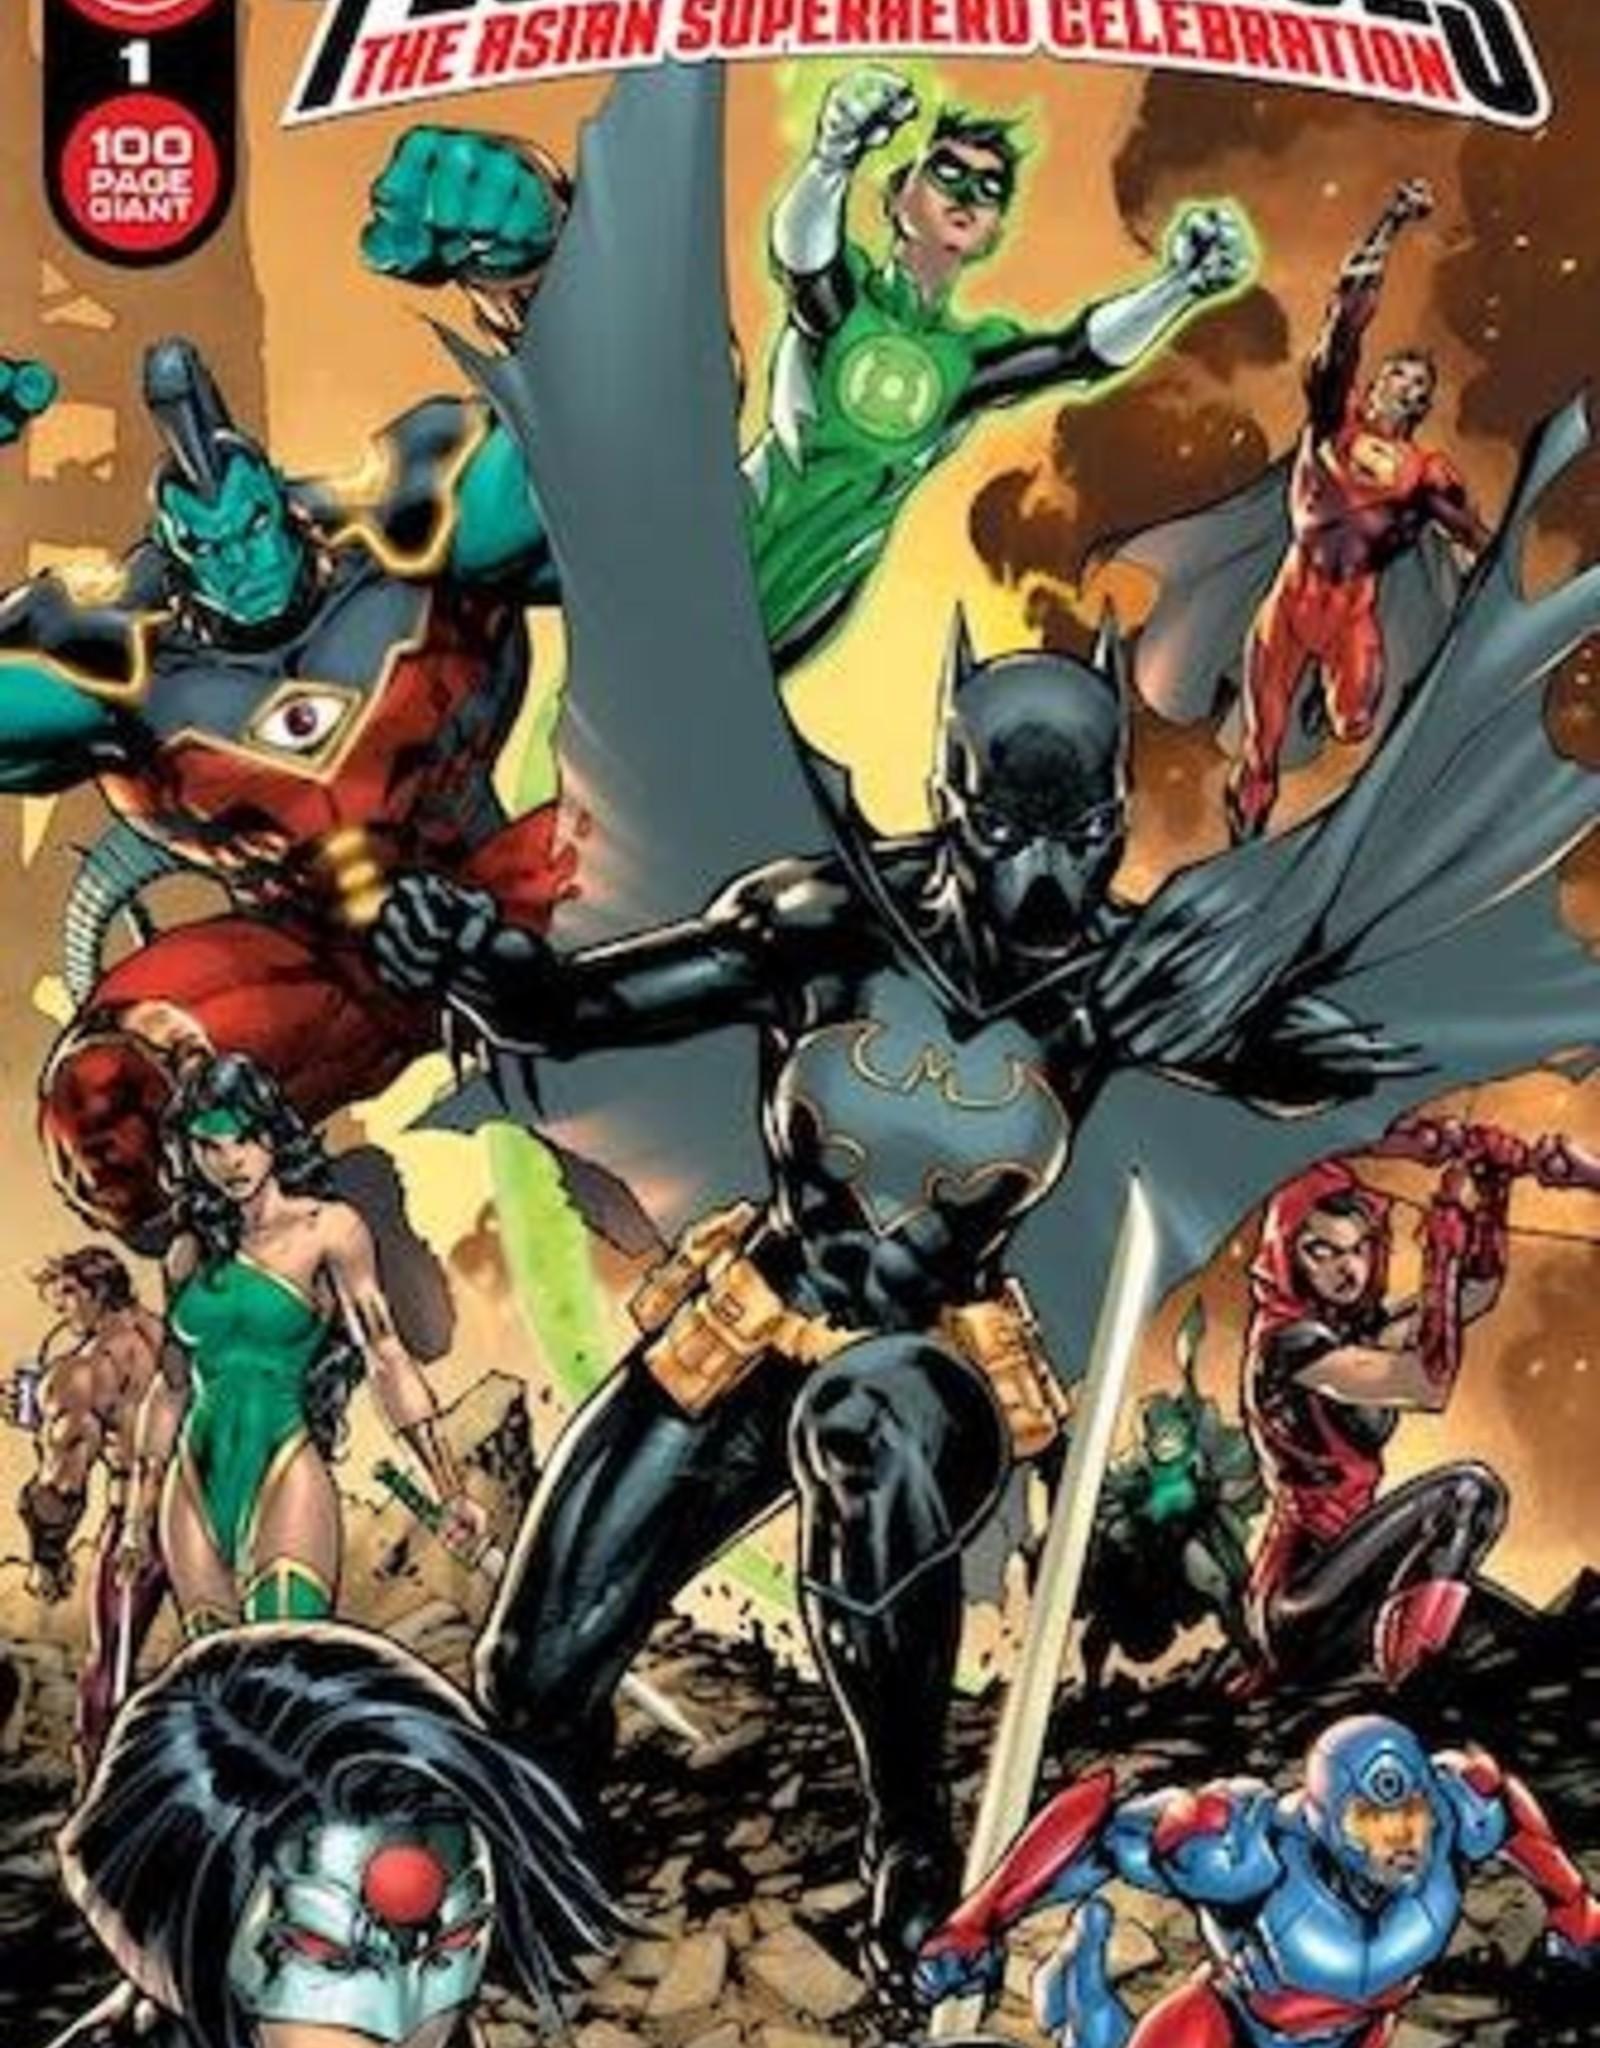 DC Comics DC Festival Of Heroes The Asian Superhero Celebration #1 (One Shot) Cvr A Jim Lee